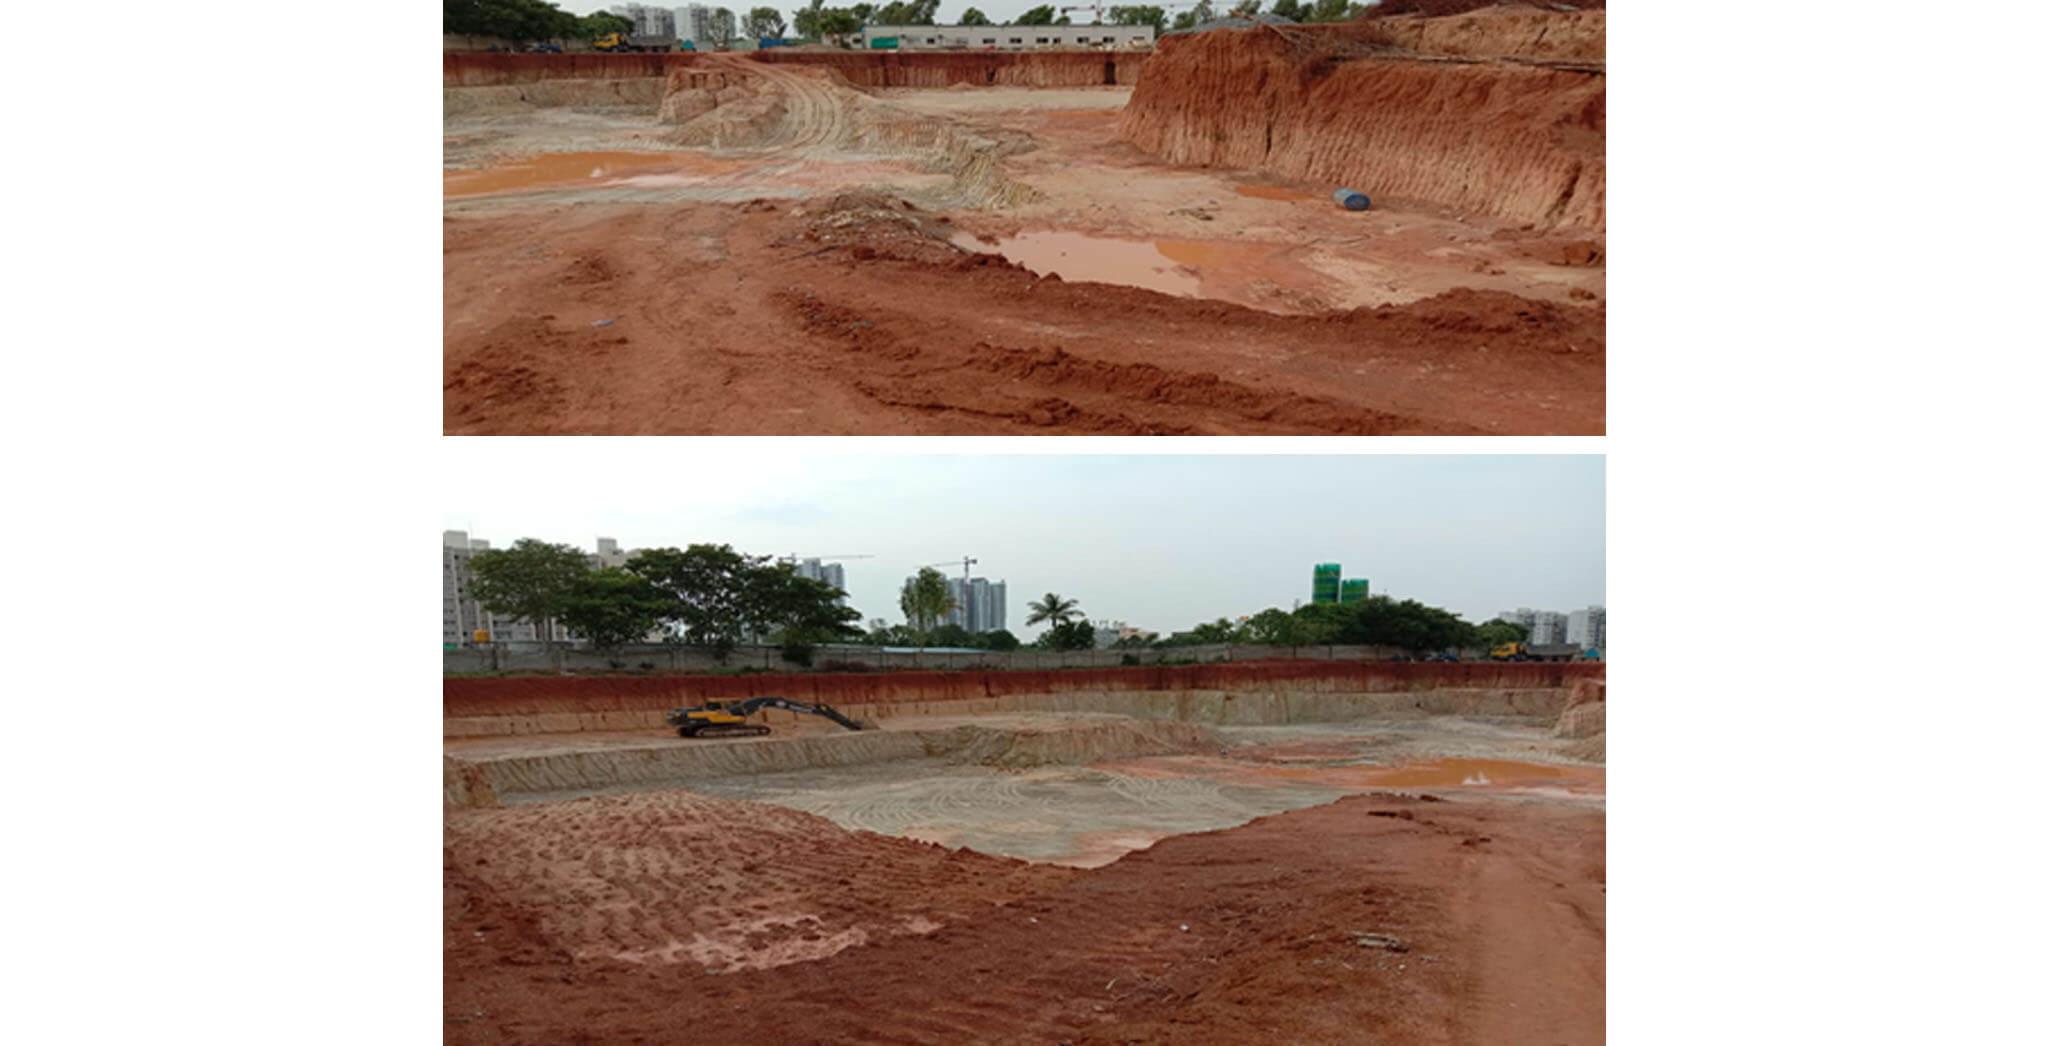 Jul 2020 - Tranquil: Towers K, L, M, N, O, P & Q—Excavation under progress